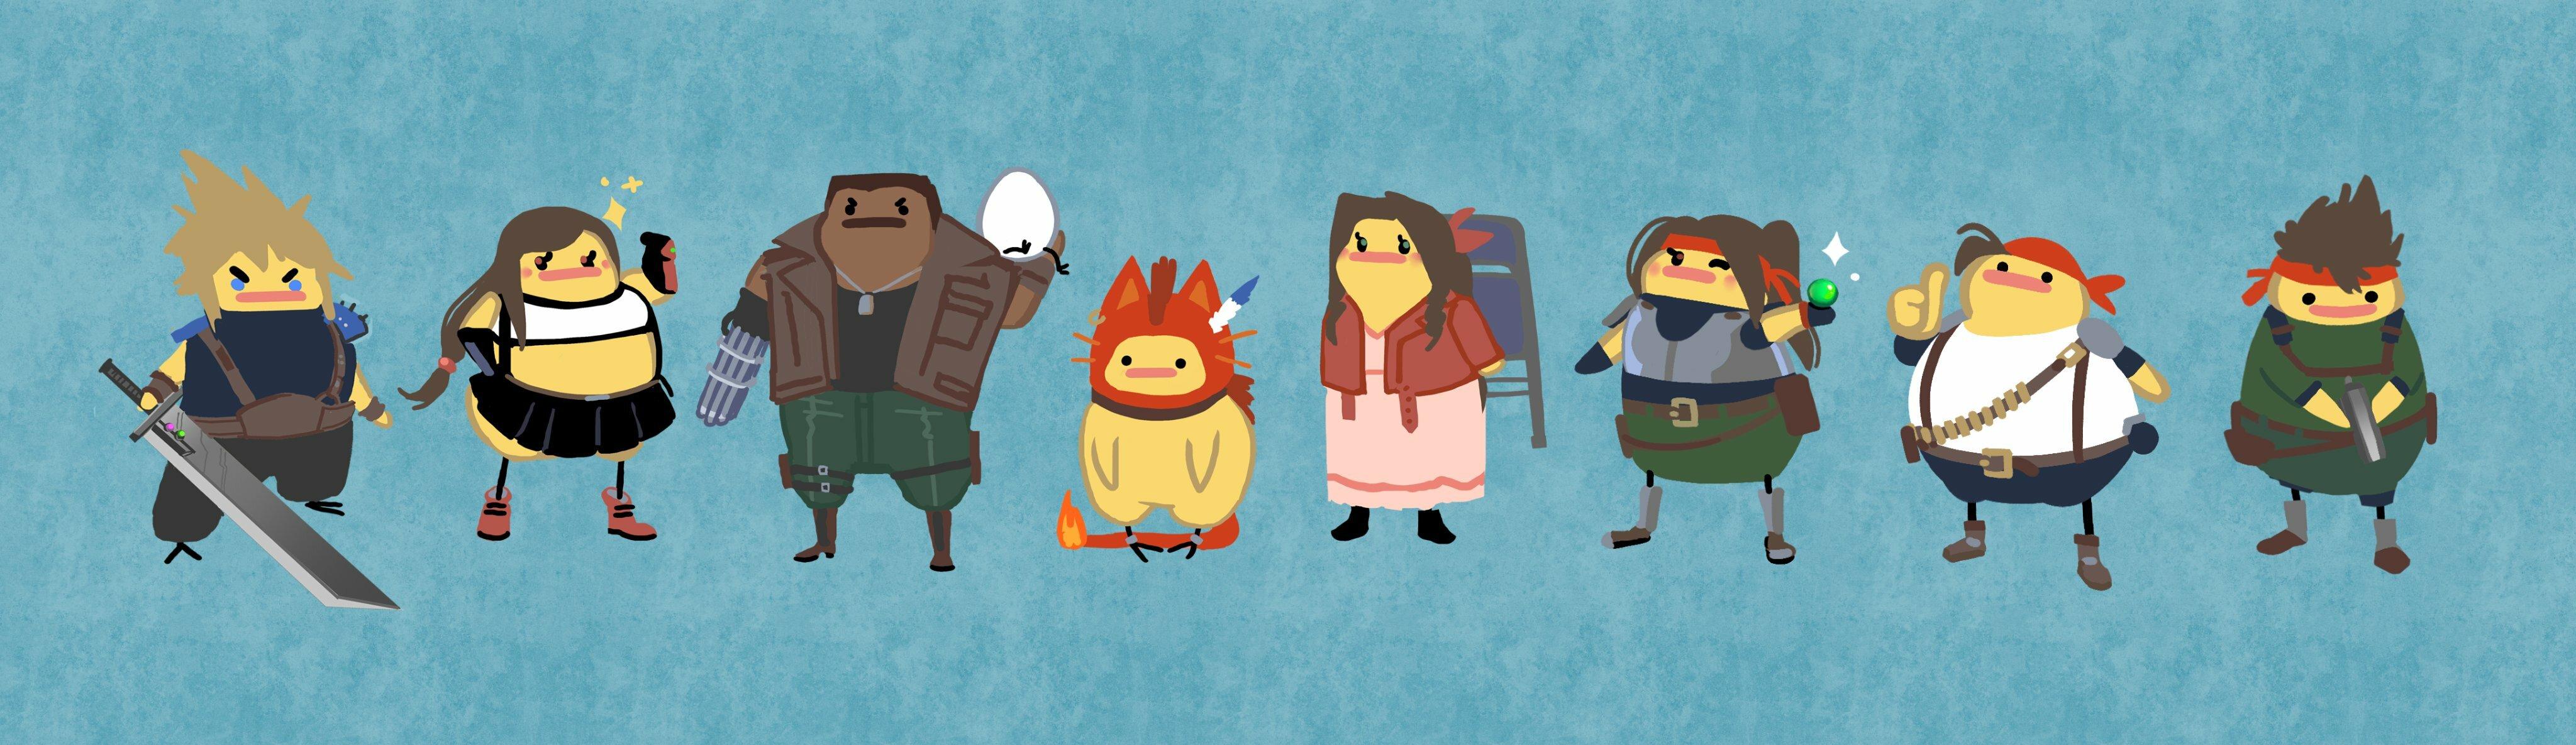 Final Fantasy Remake: Birdblob Edition